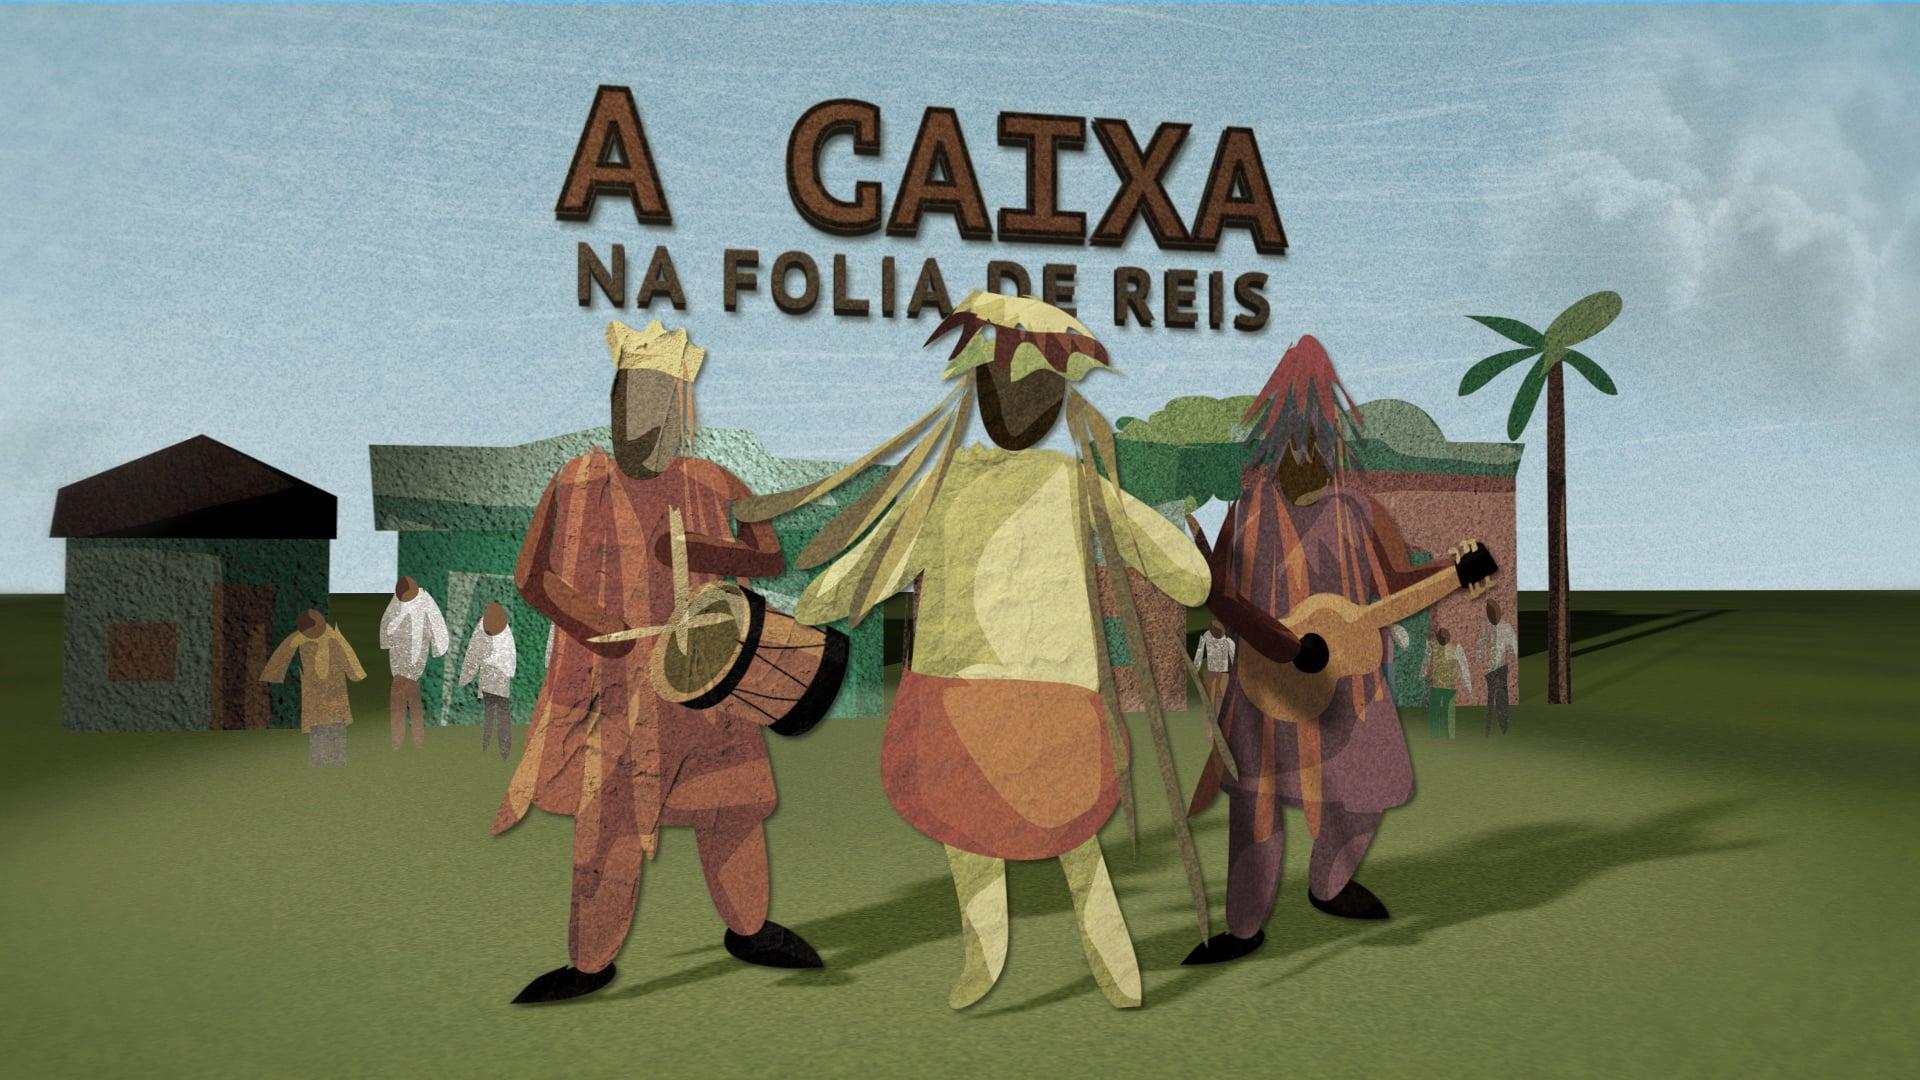 Taquaras 2 - Ep09 - Caixa (Teaser)